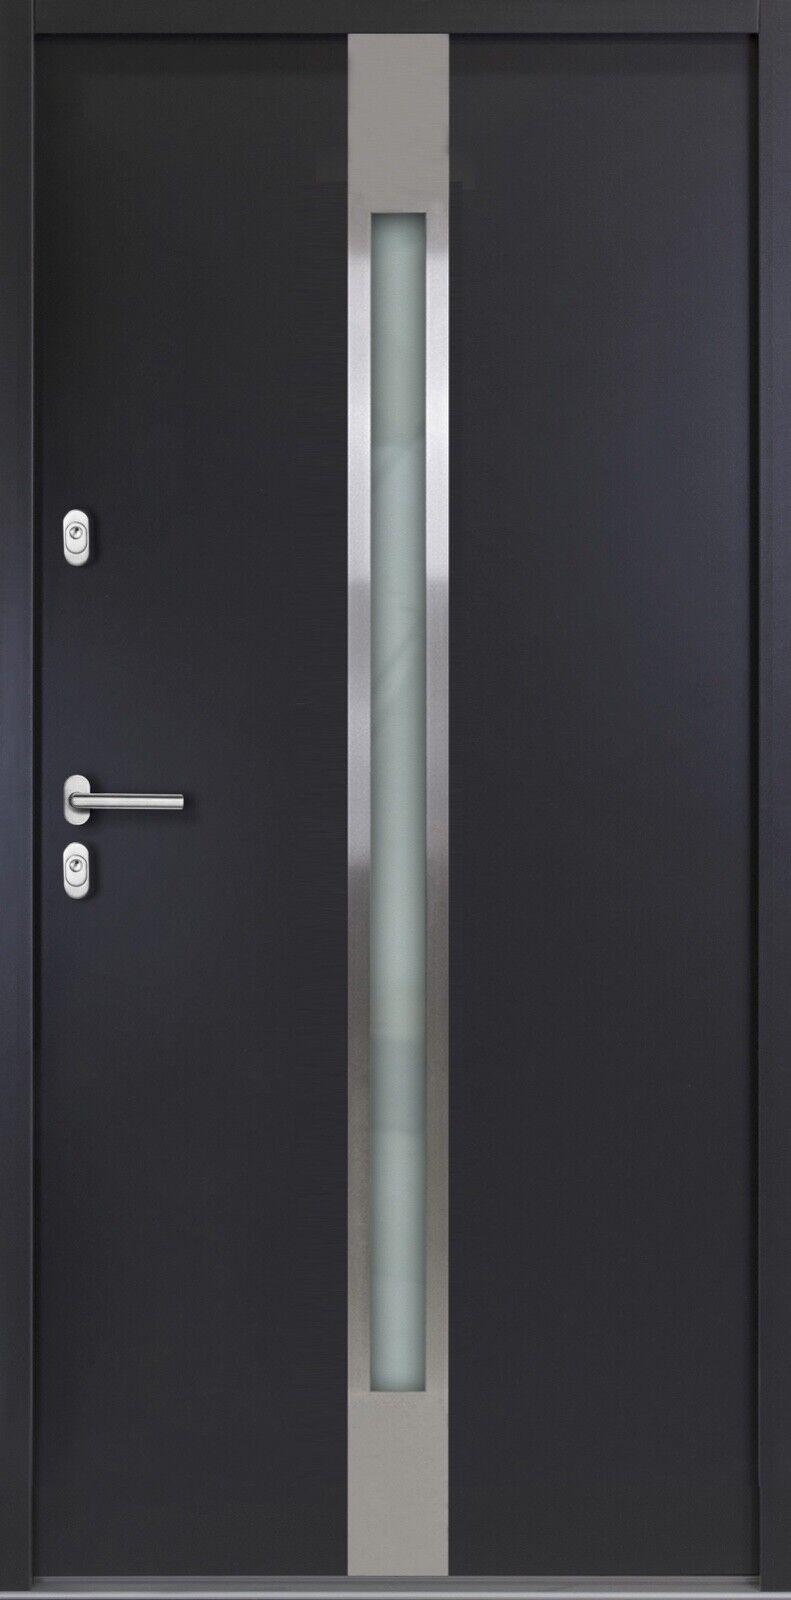 Aktionshaustür  Aluminium Haustür Alu AT505 - Ausstellung Werne